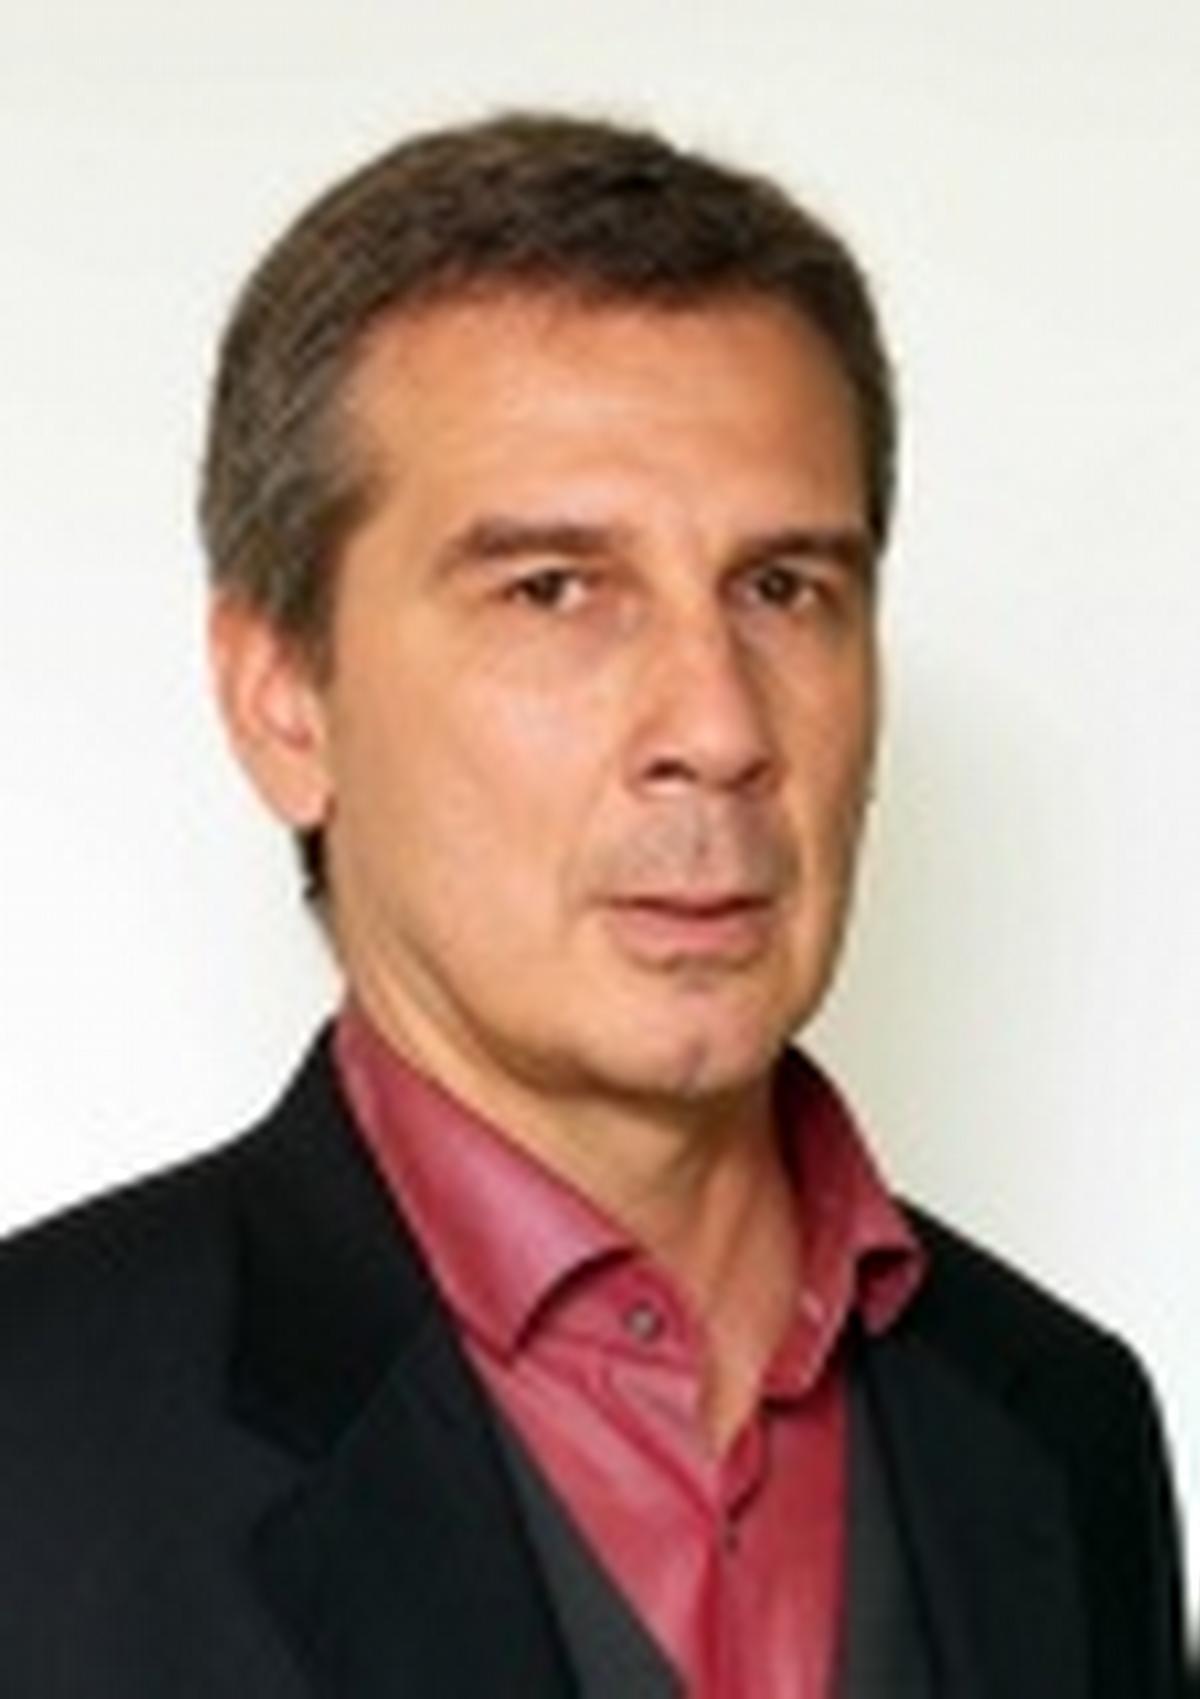 Pedro Gomez, KCT data